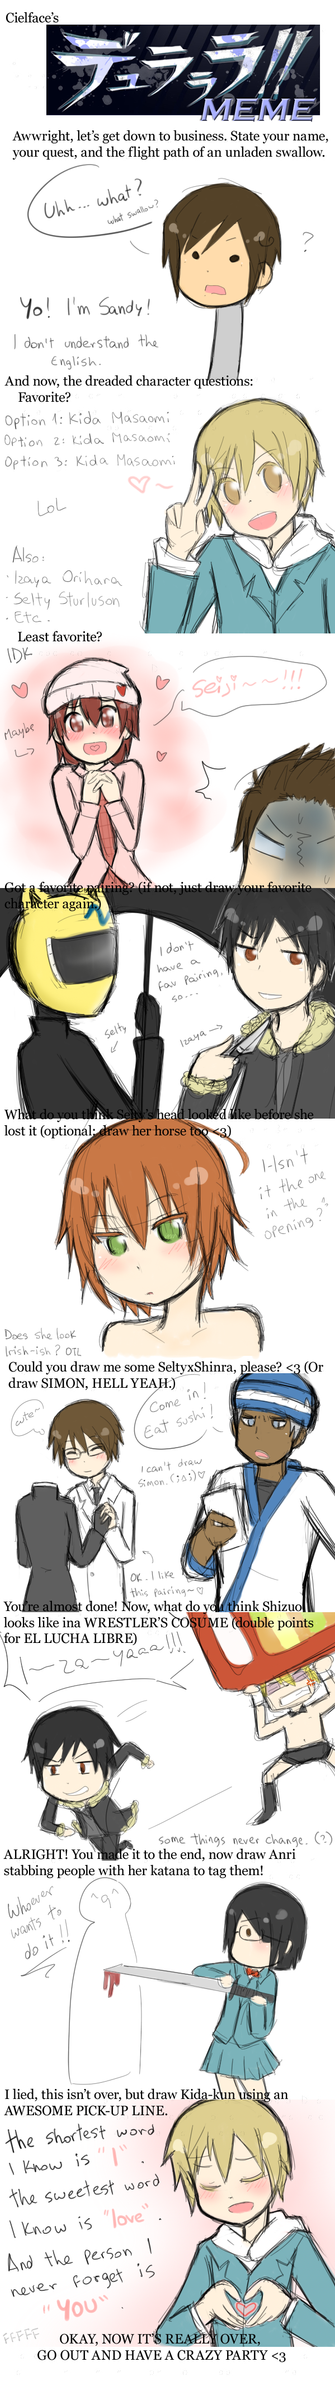 :DRRR: Meme -slight spoilers- by s-a-n-d-y